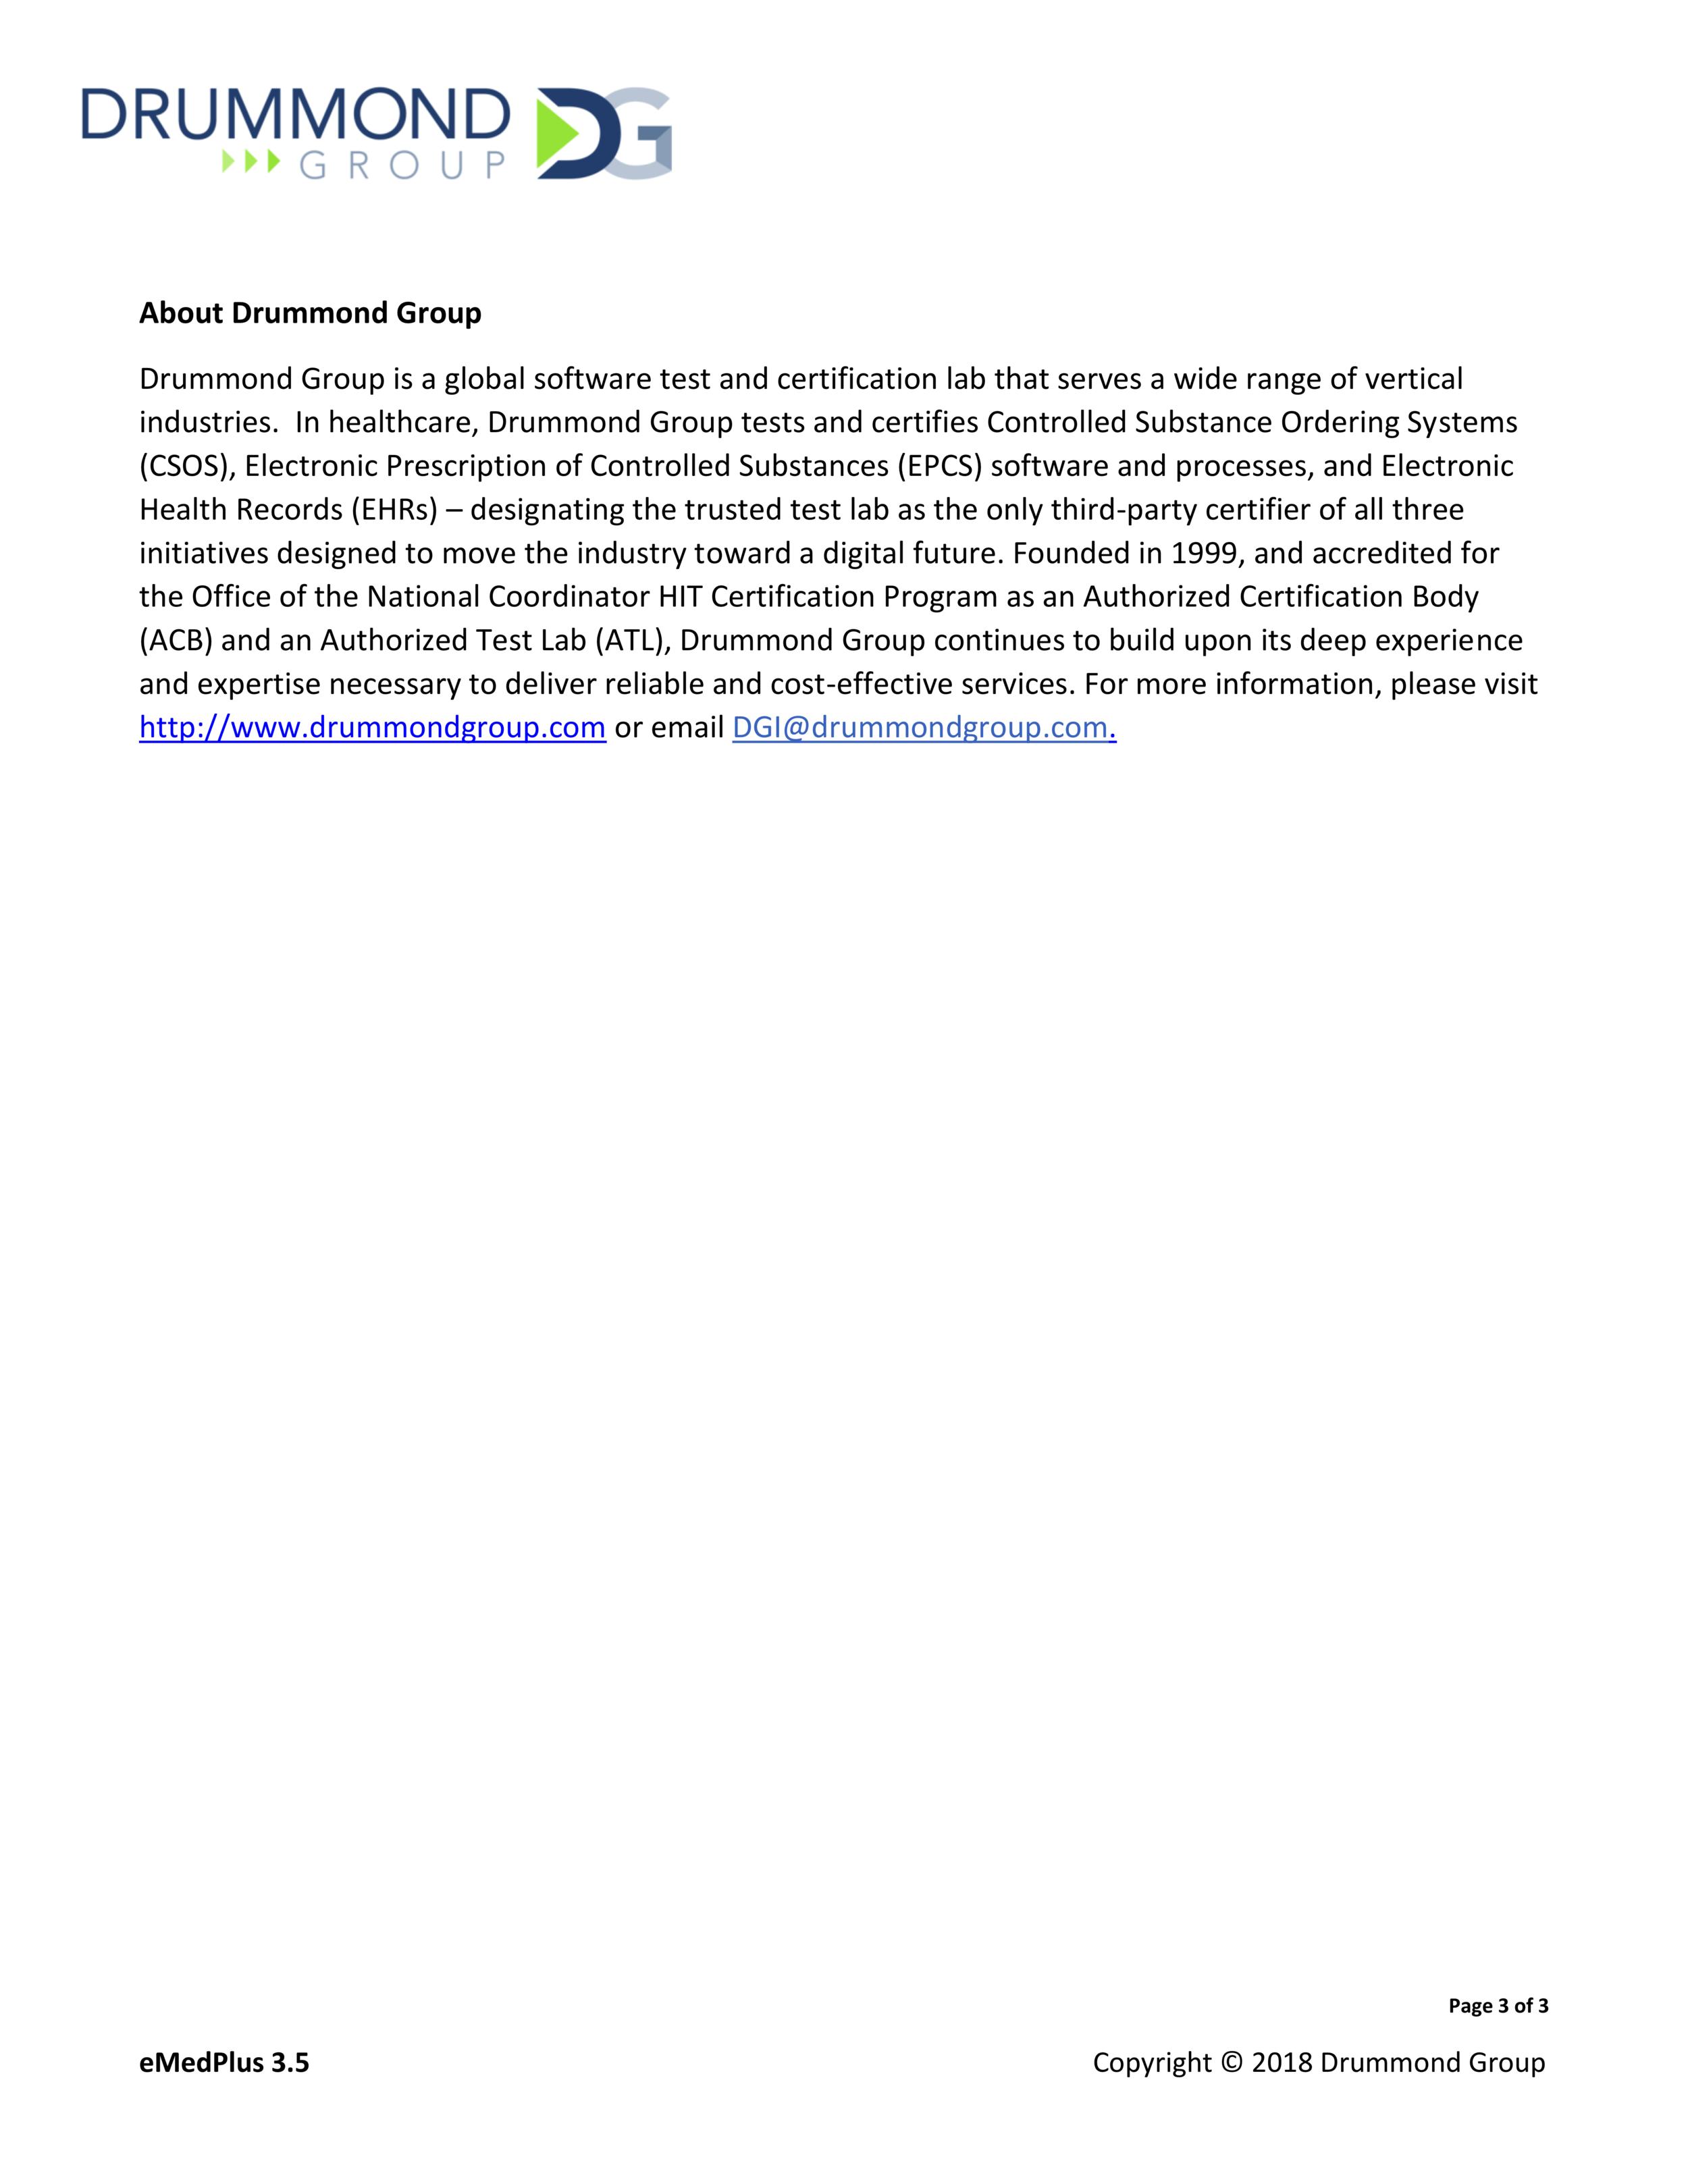 EPCS Certificate Pg. 3.png